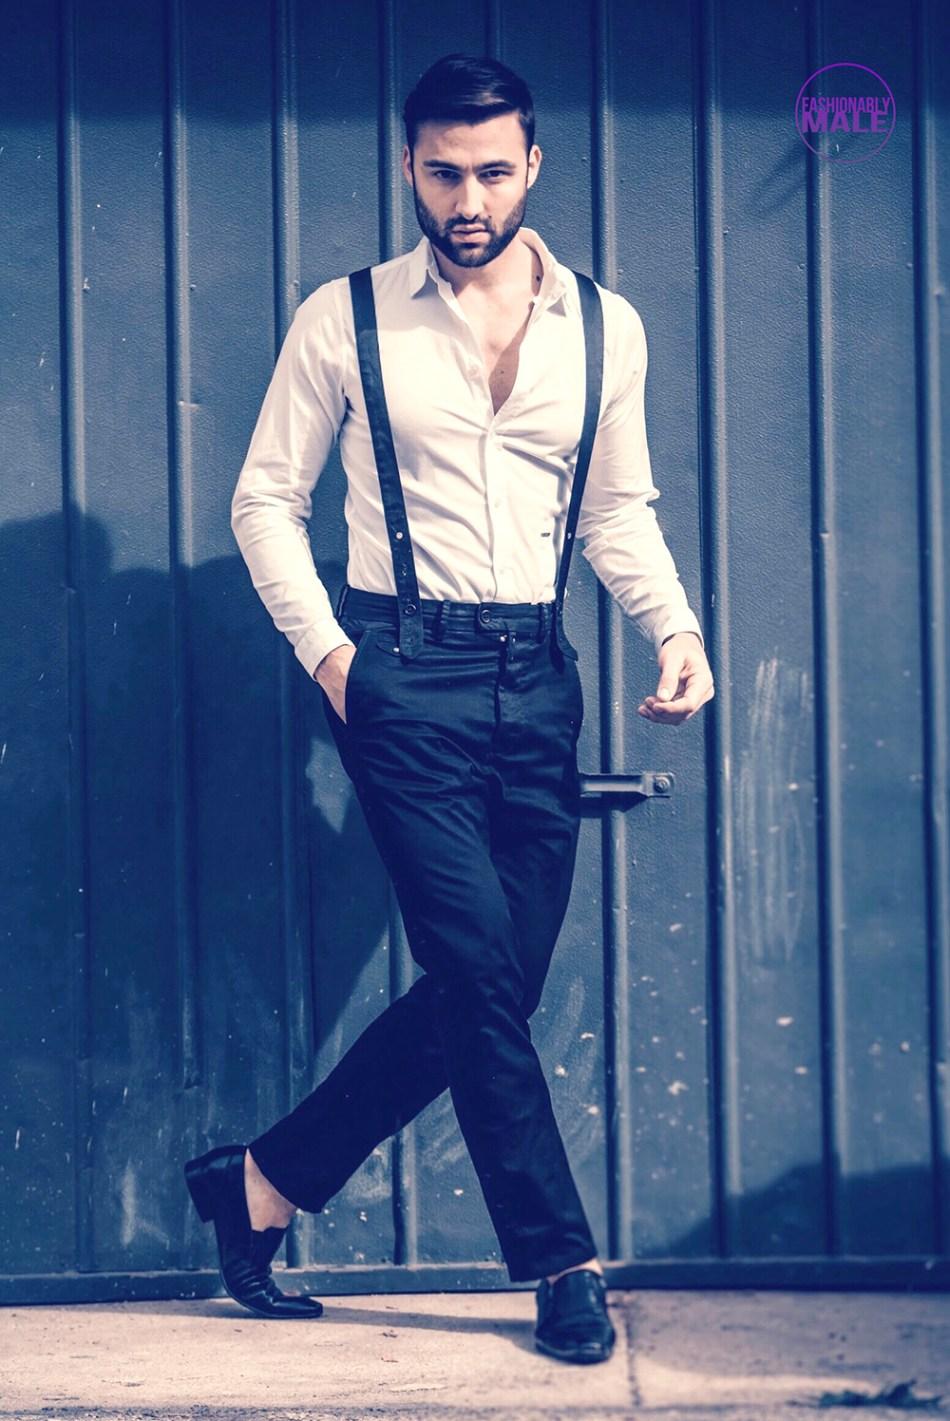 Model John Strand Slays in India where He Works Successfully